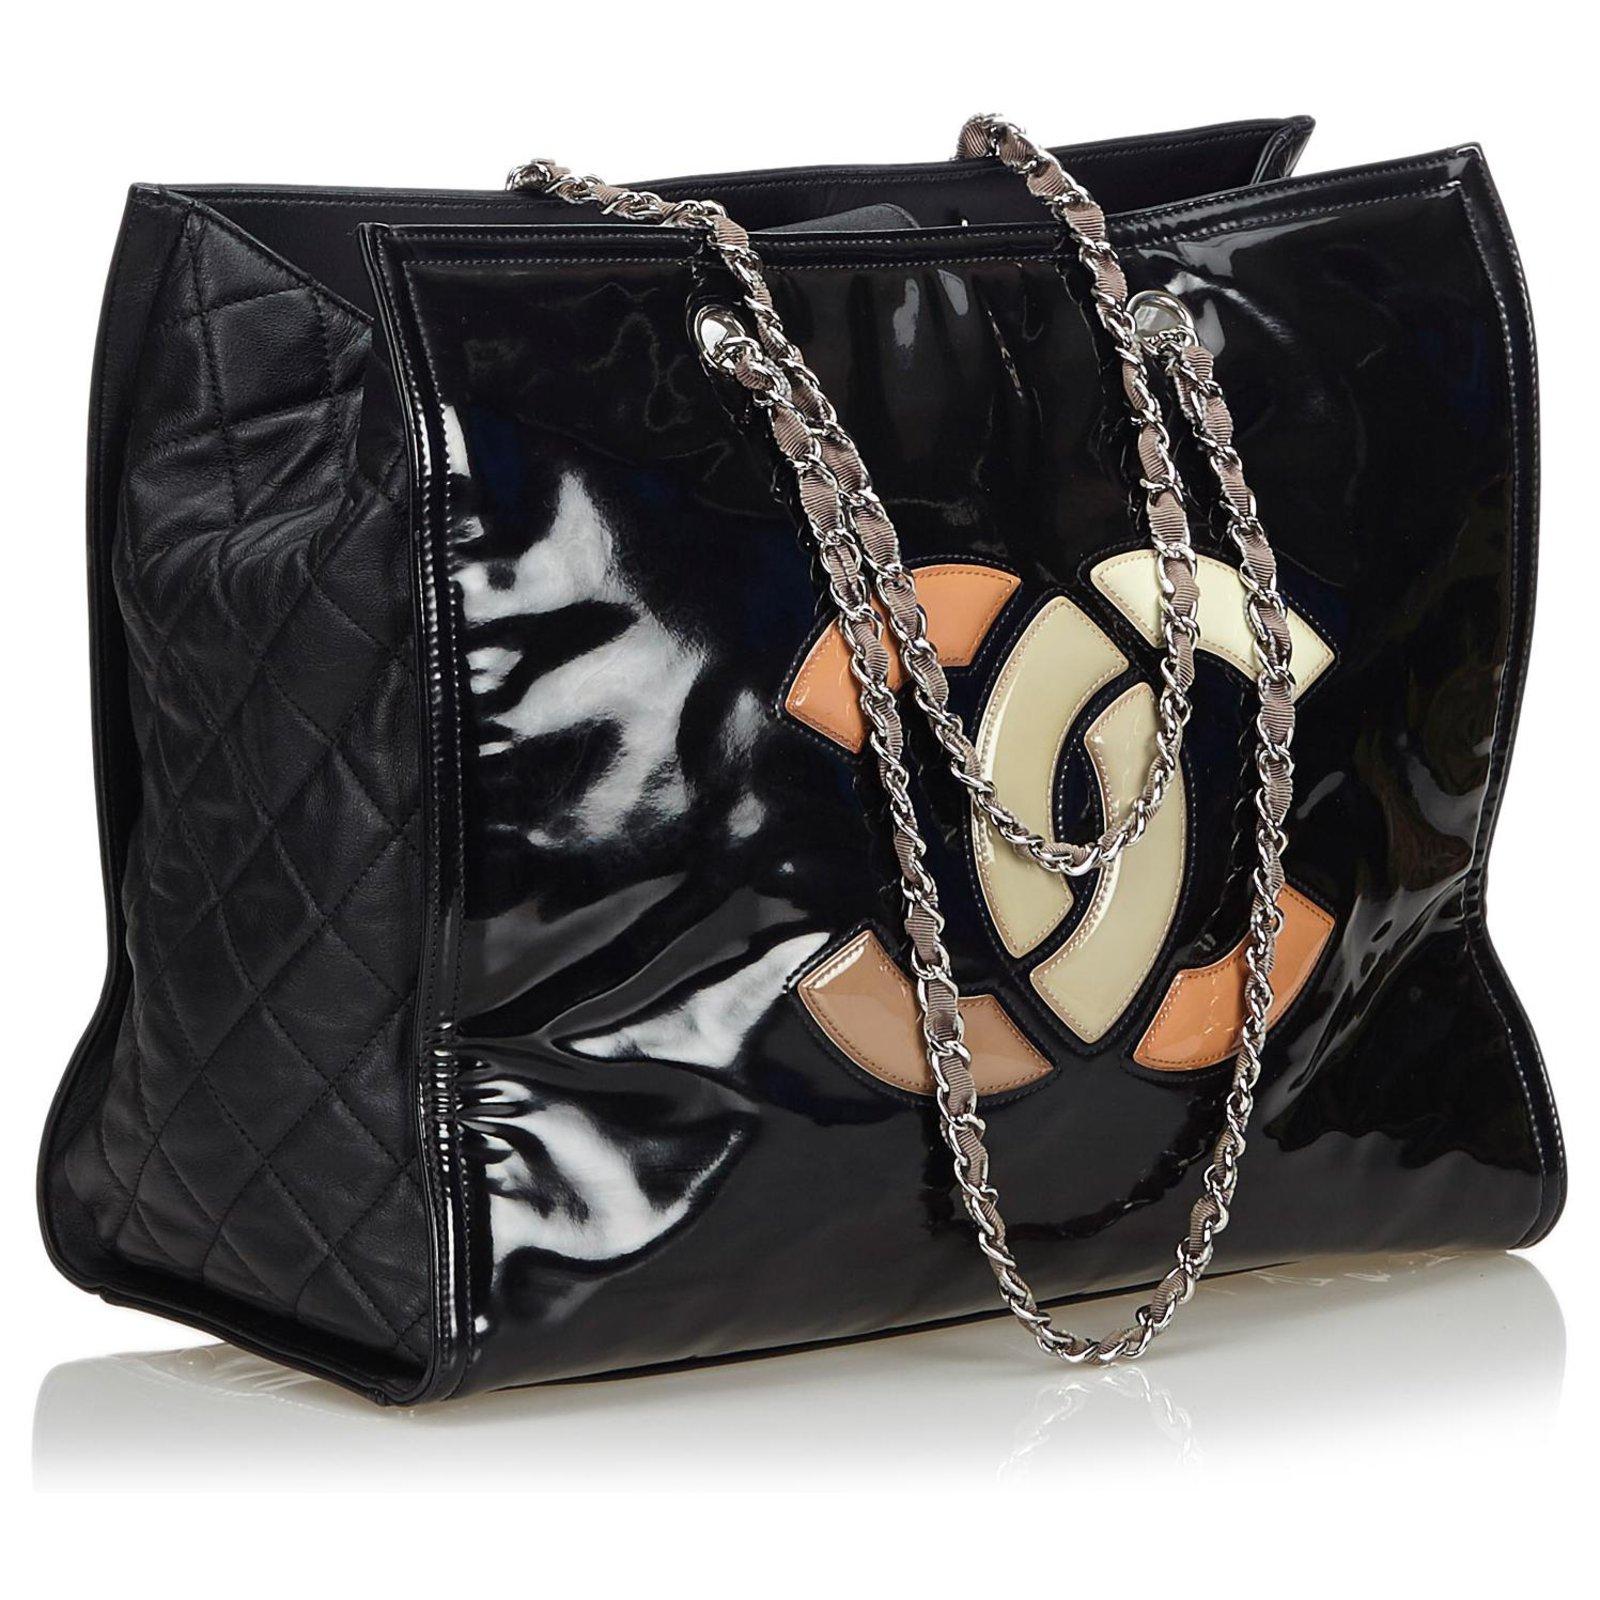 d098252f9f0976 Chanel Patent Leather Lipstick Tote Bag Totes Leather,Patent leather ...